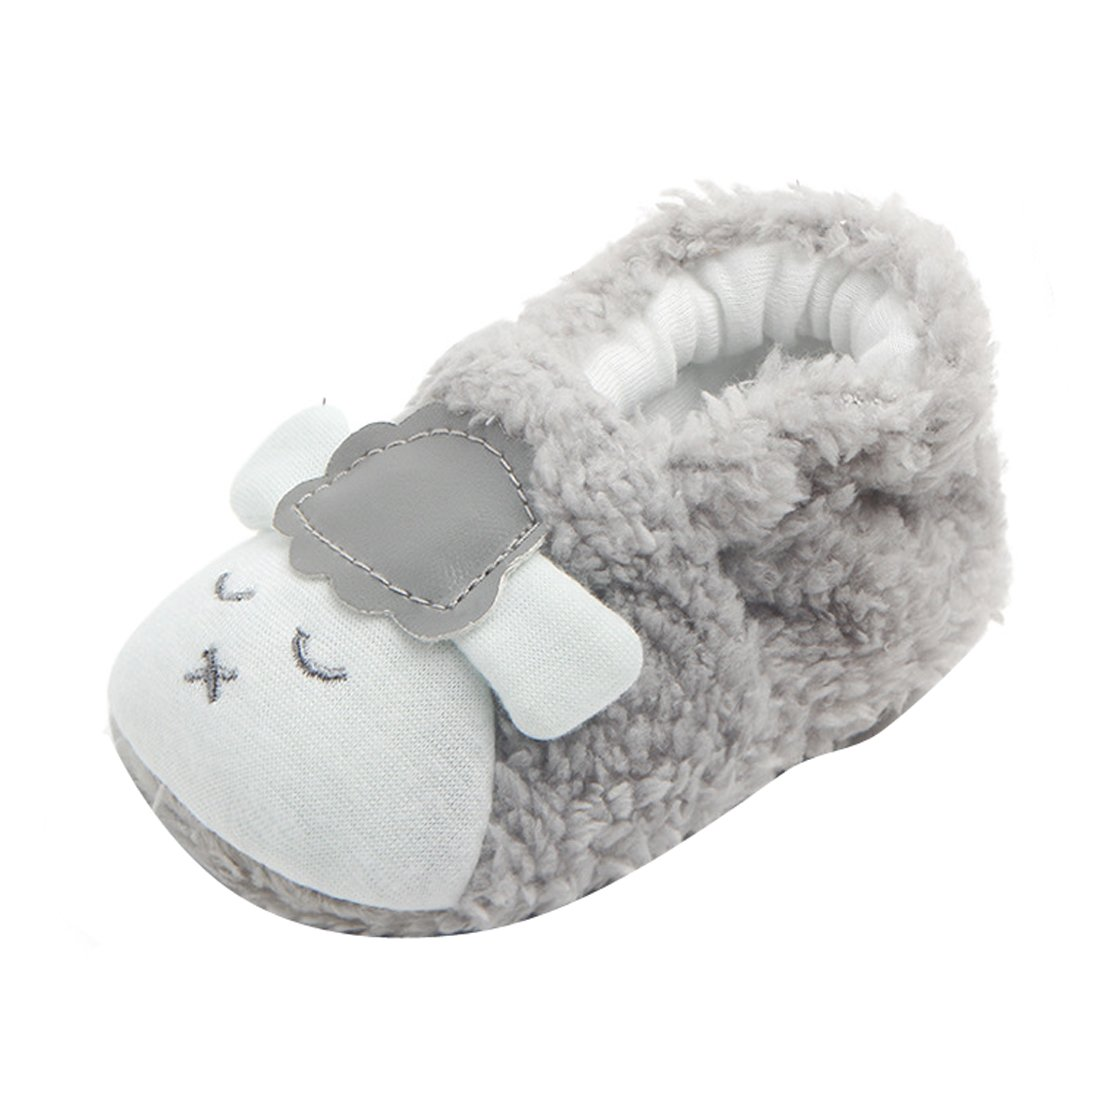 WINZIK Newborn Baby Boys Girls Crib Shoes Winter Warm Cute Sheep Style Soft Sole Slipper Prewalker Toddler Boots